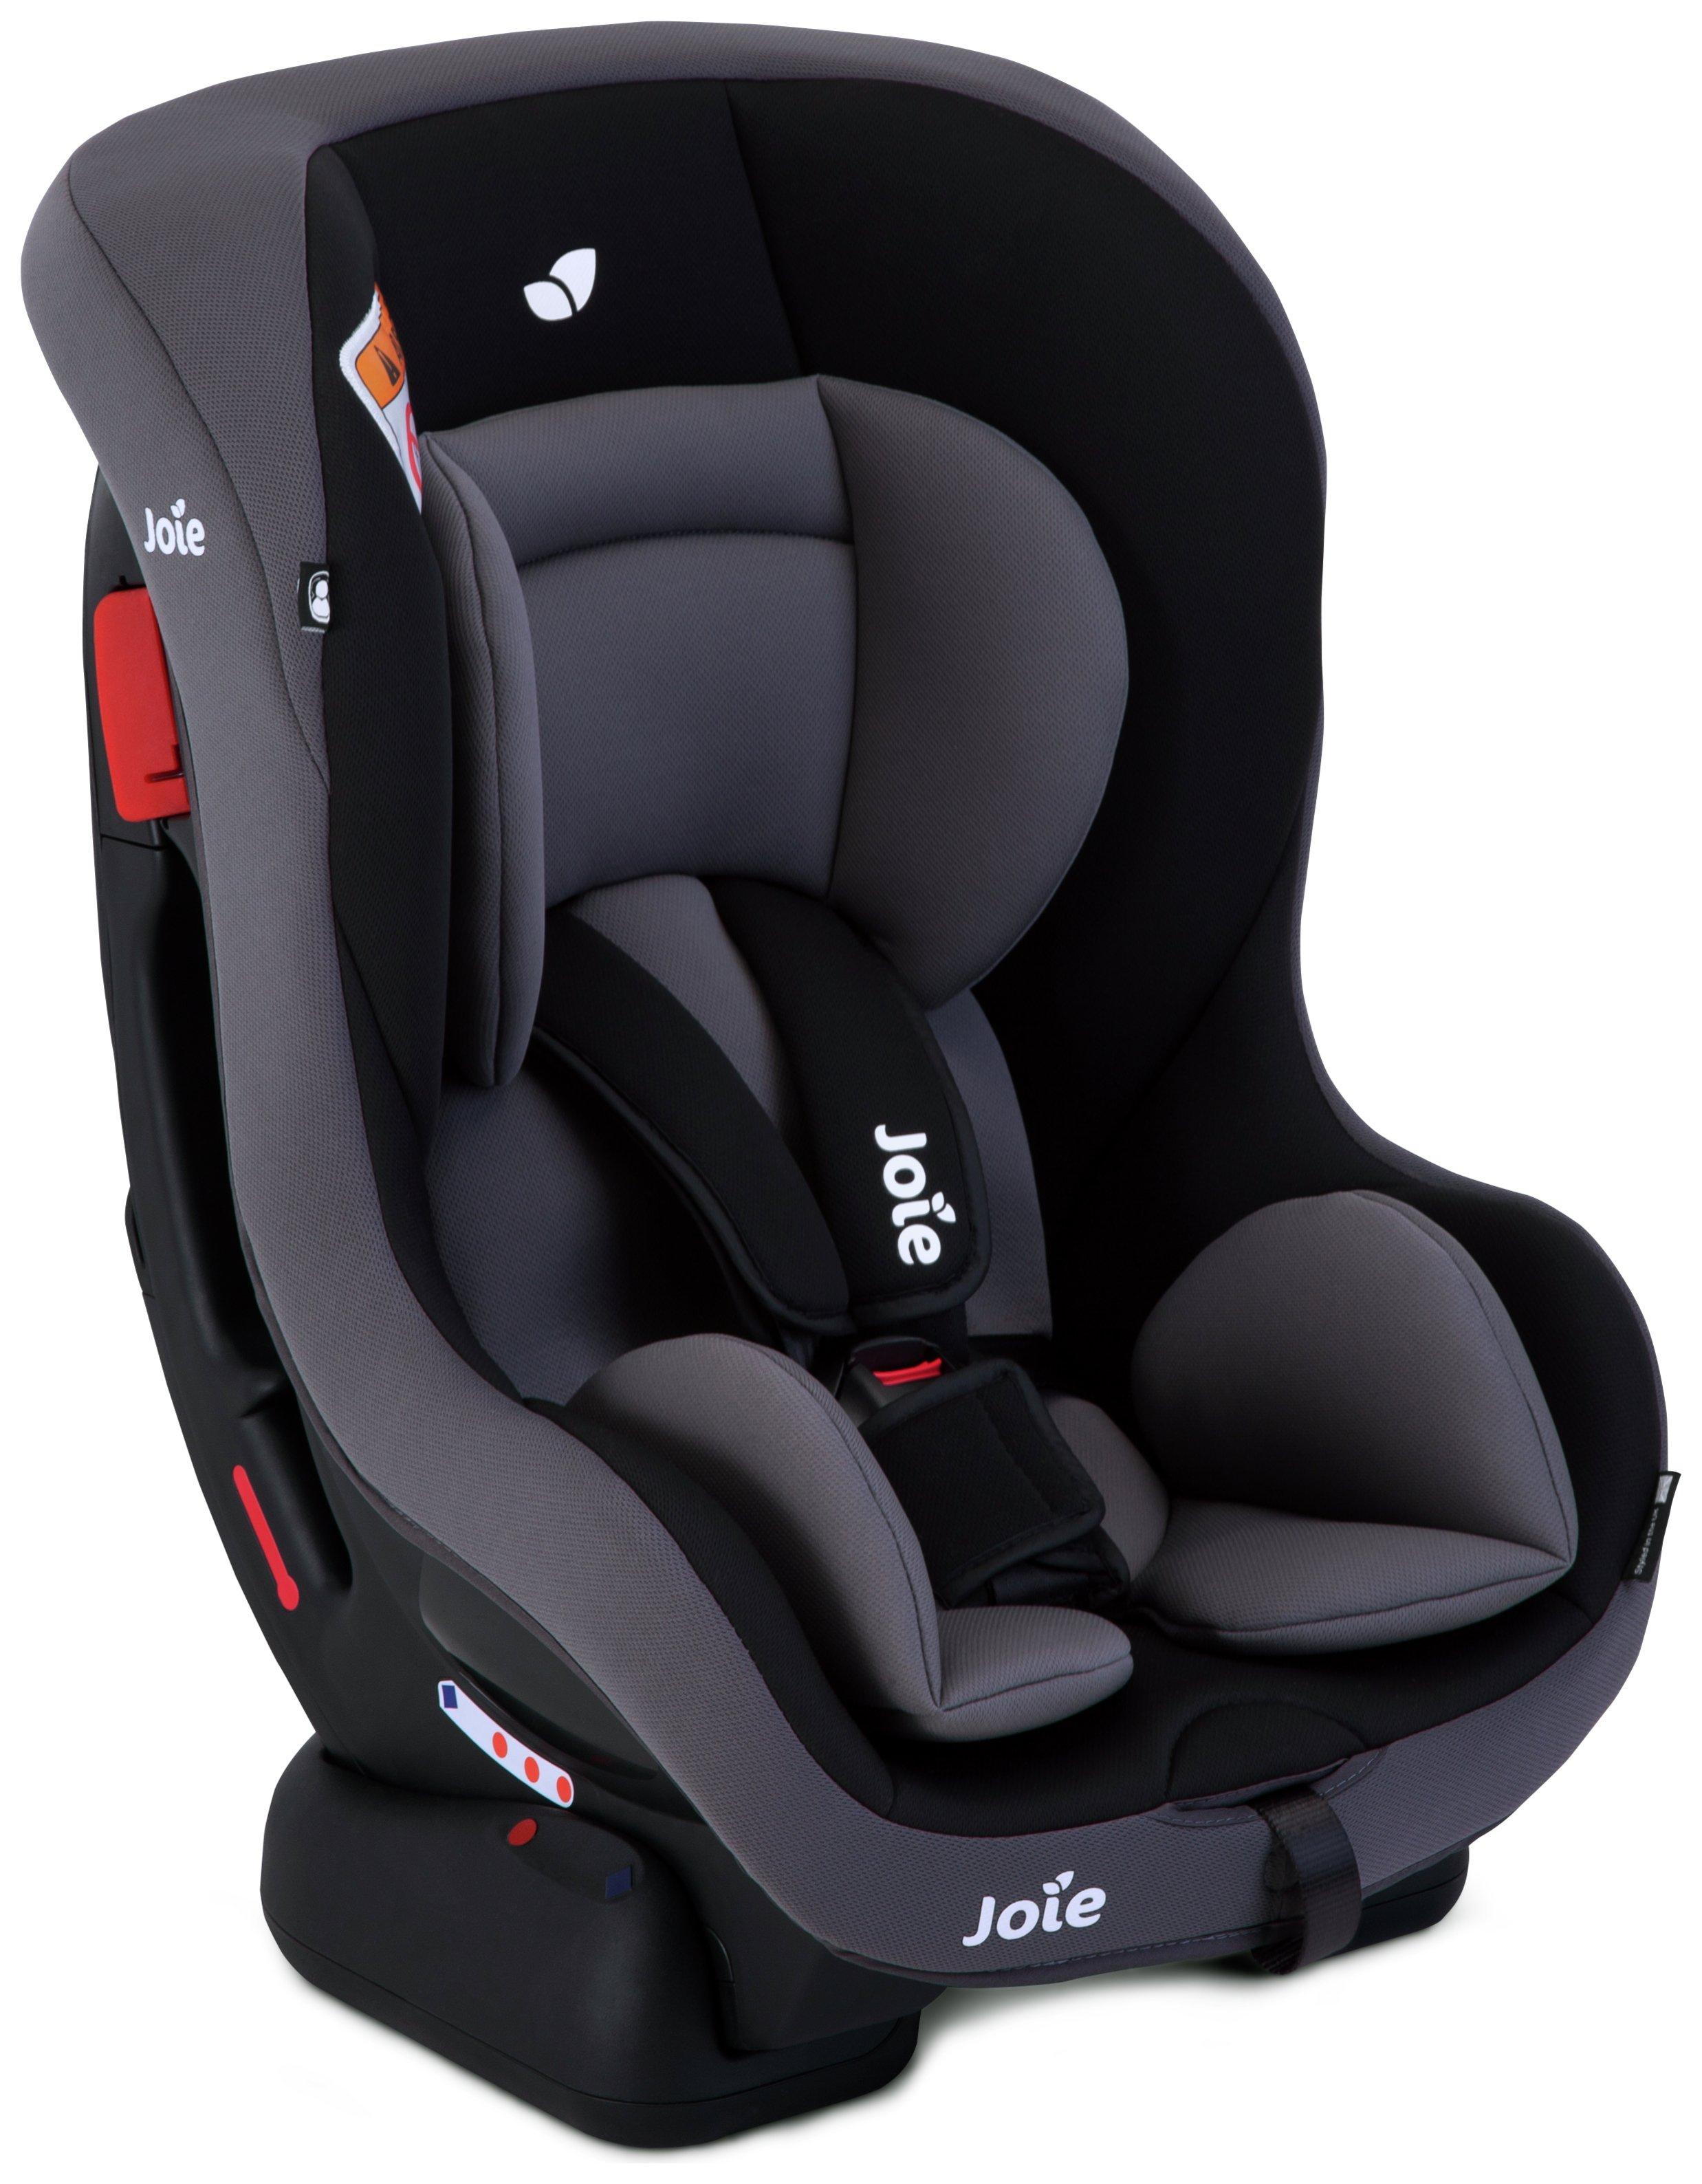 Joie Tilt Group 0+/1 Car Seat - Two Tone Black £49.99 at Argos